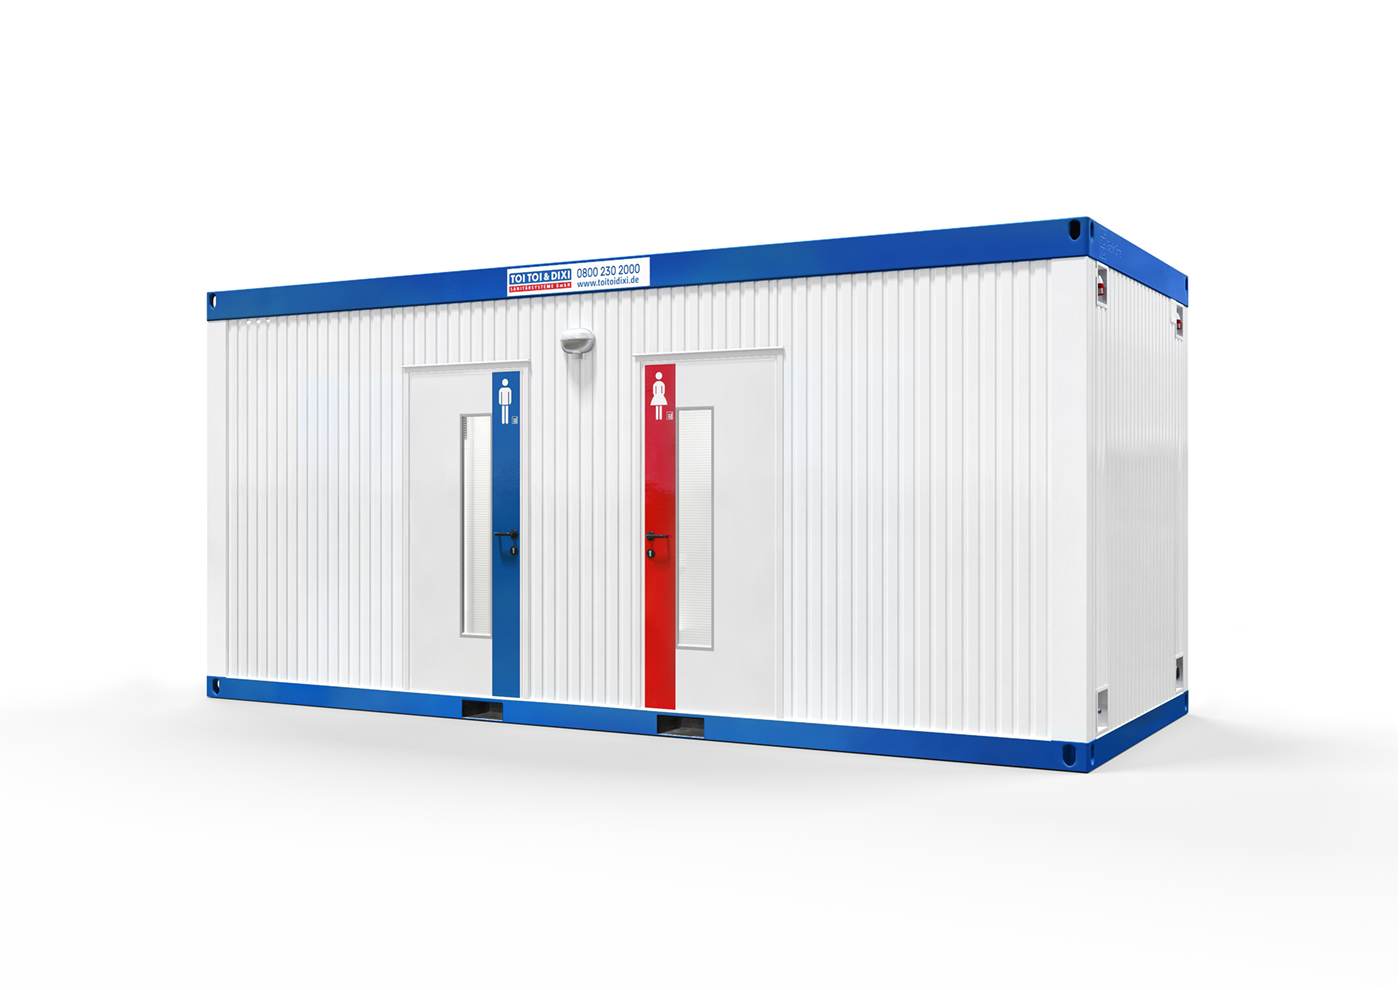 Charmant Sanitärcontainer   Container   DIXI® Klo U0026 Bürocontainer Mieten   TOI TOI U0026  DIXI